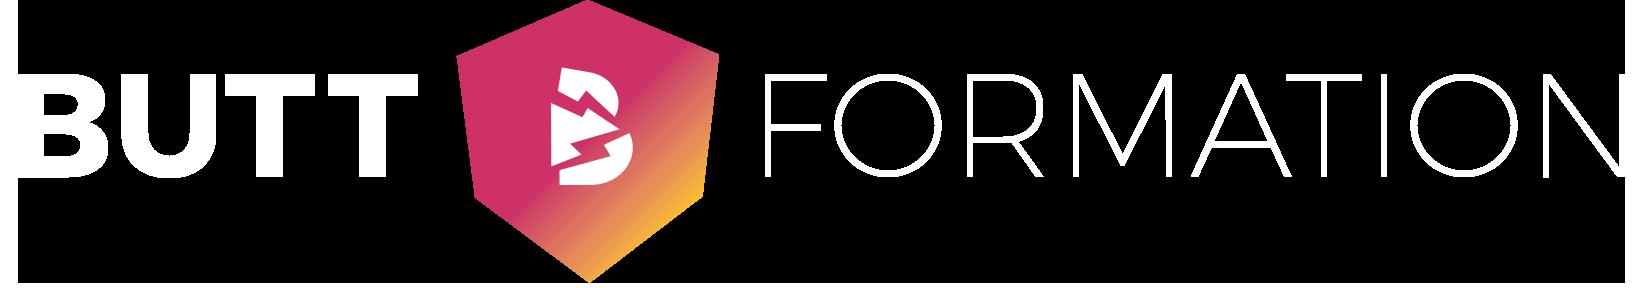 ButtFormation Logo